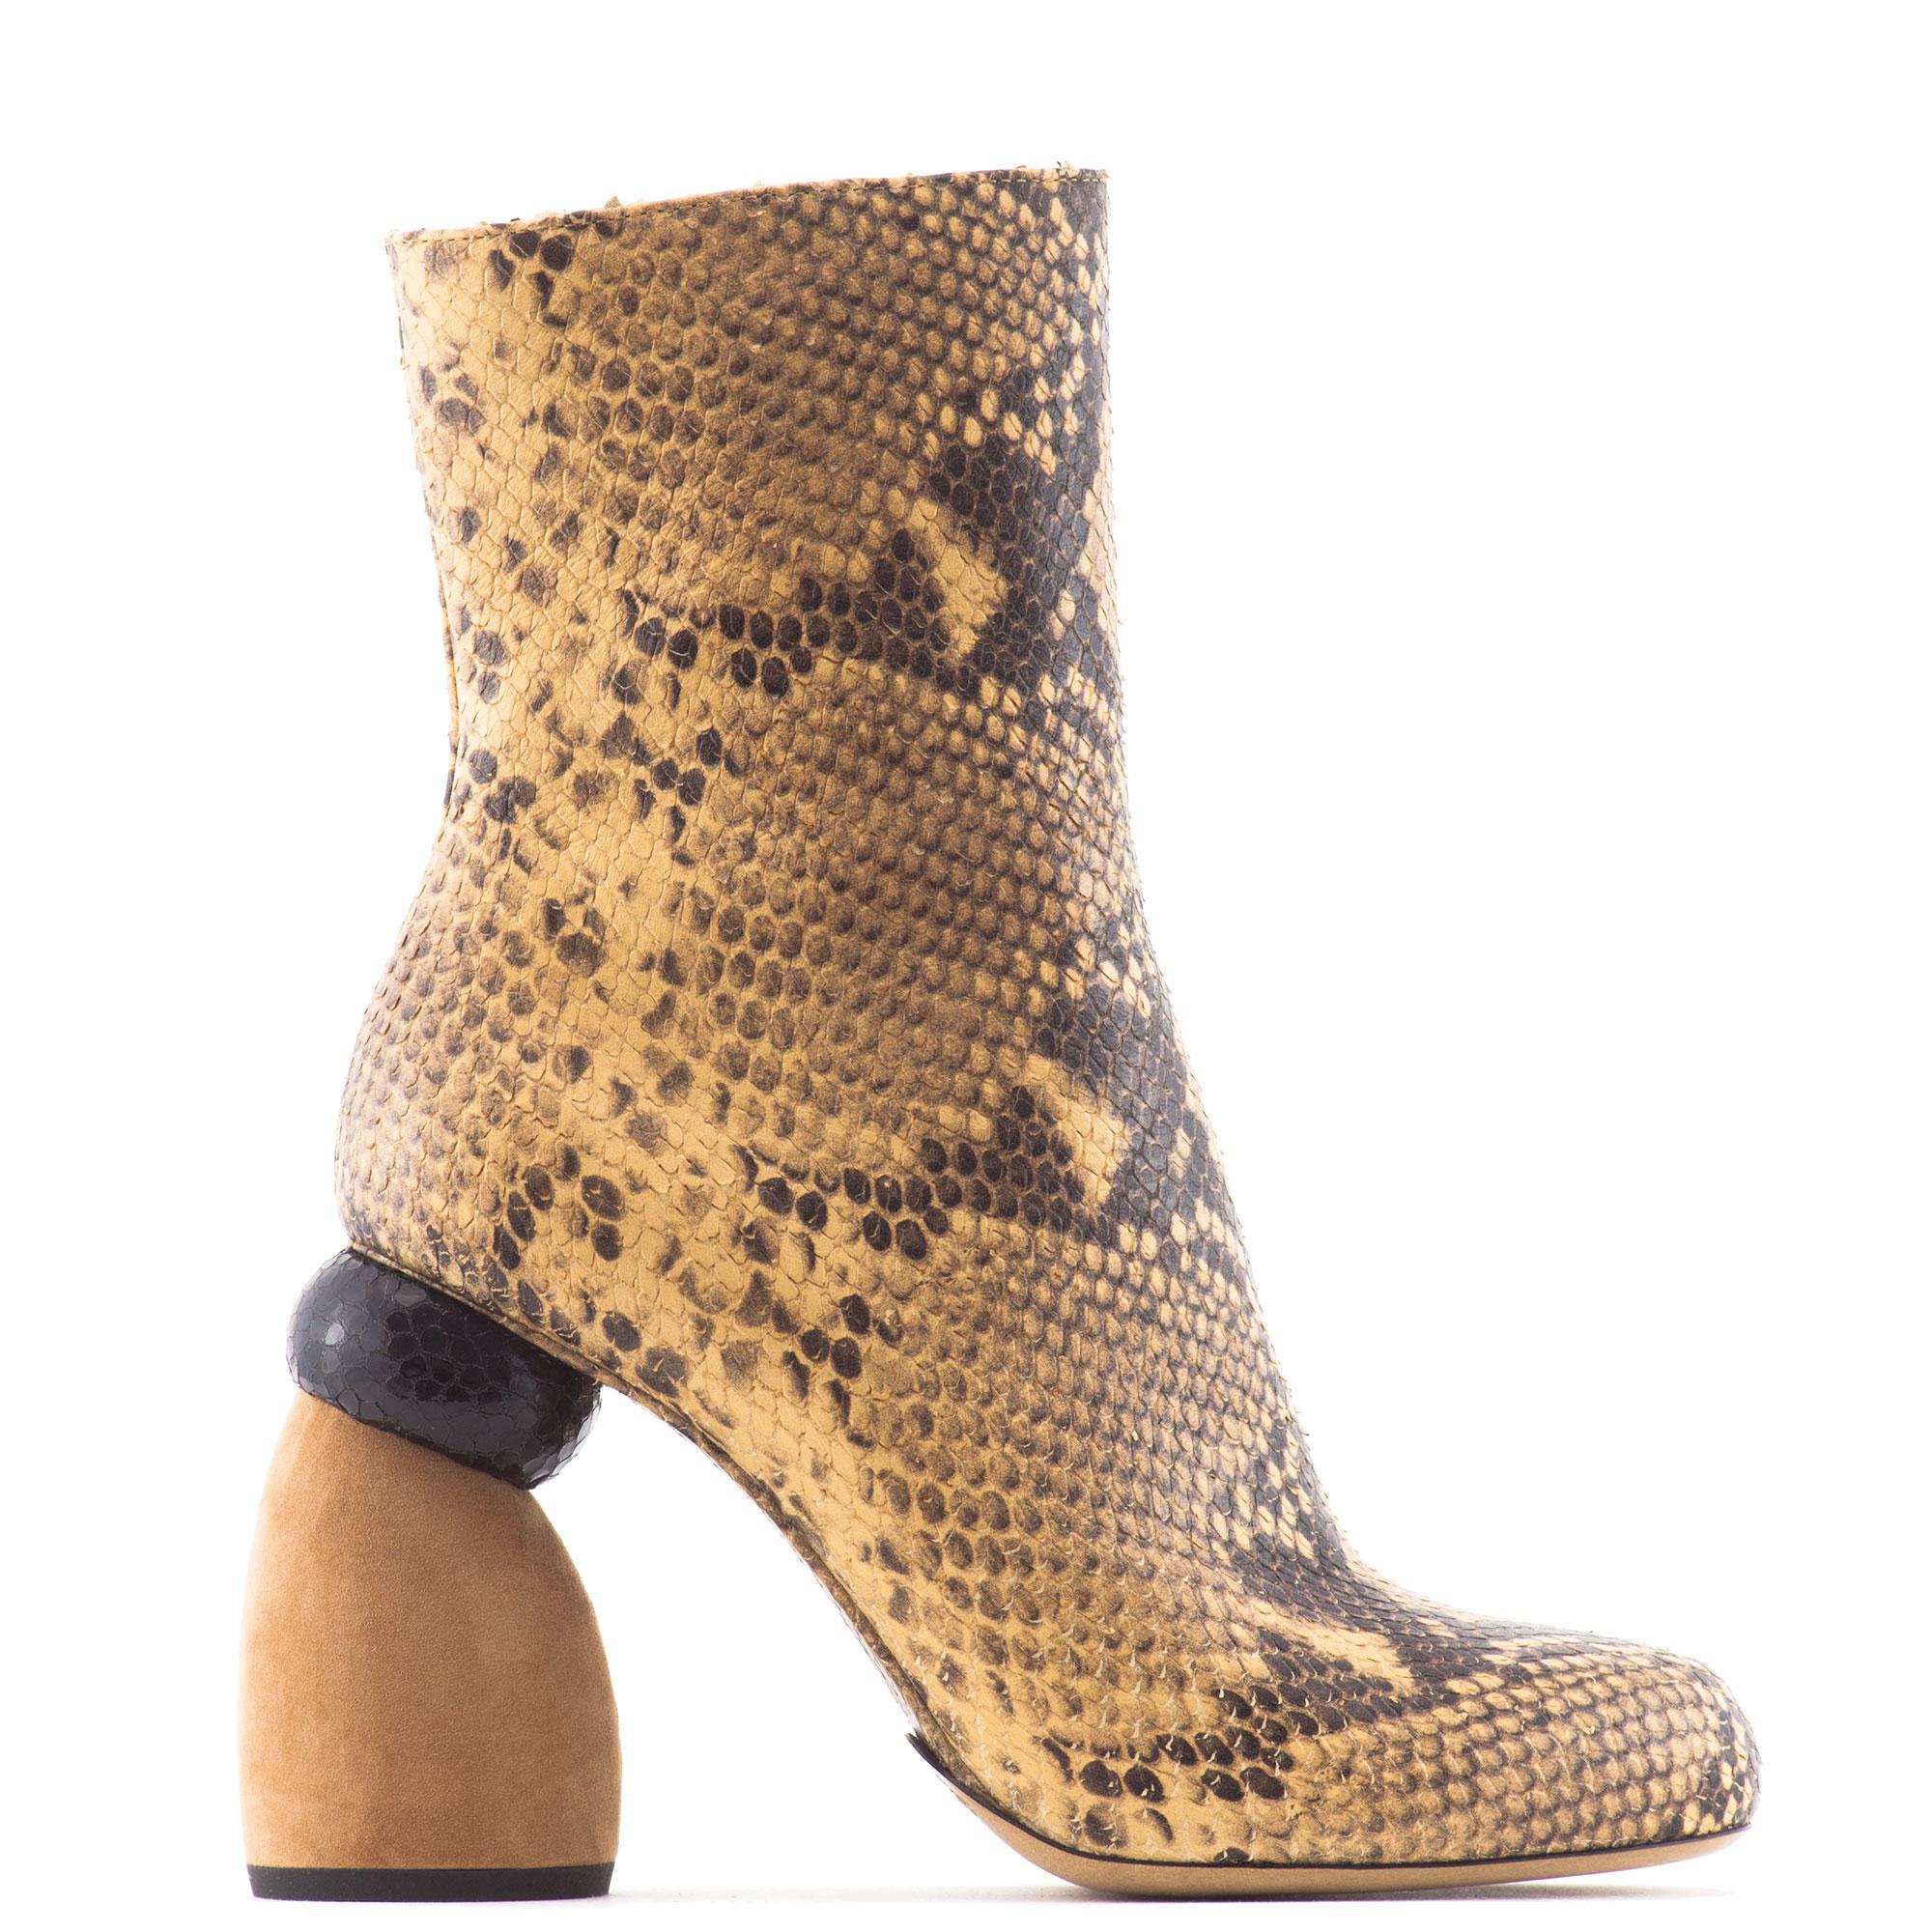 20dbd6eaac8540 Dries Van Noten 110mm Sculpted Heel Printed Python Boots in Natural ...